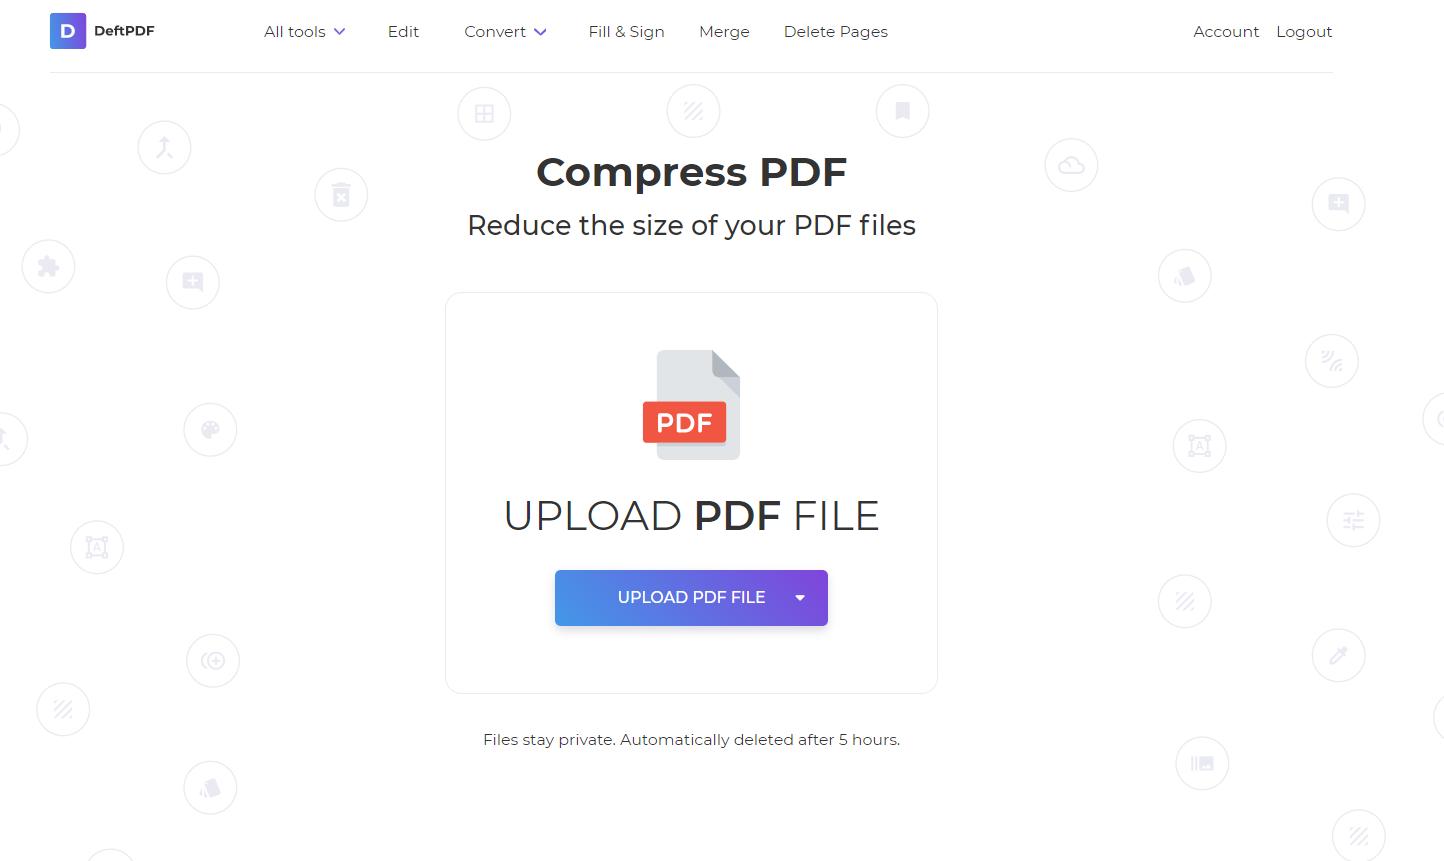 upload pdf file in compress tool